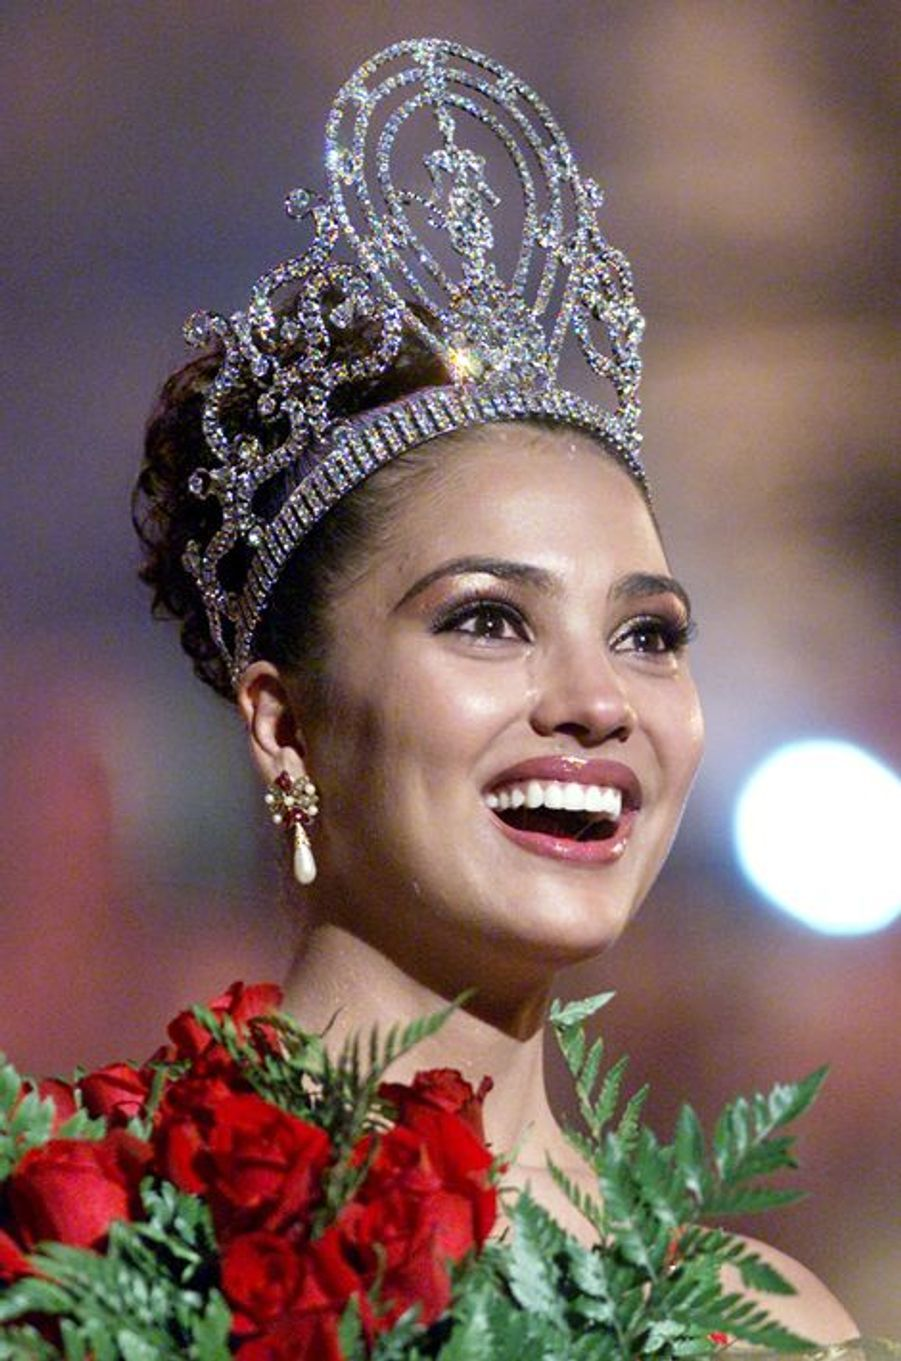 Lara Dutta, Miss Inde élue Miss Univers en 2000